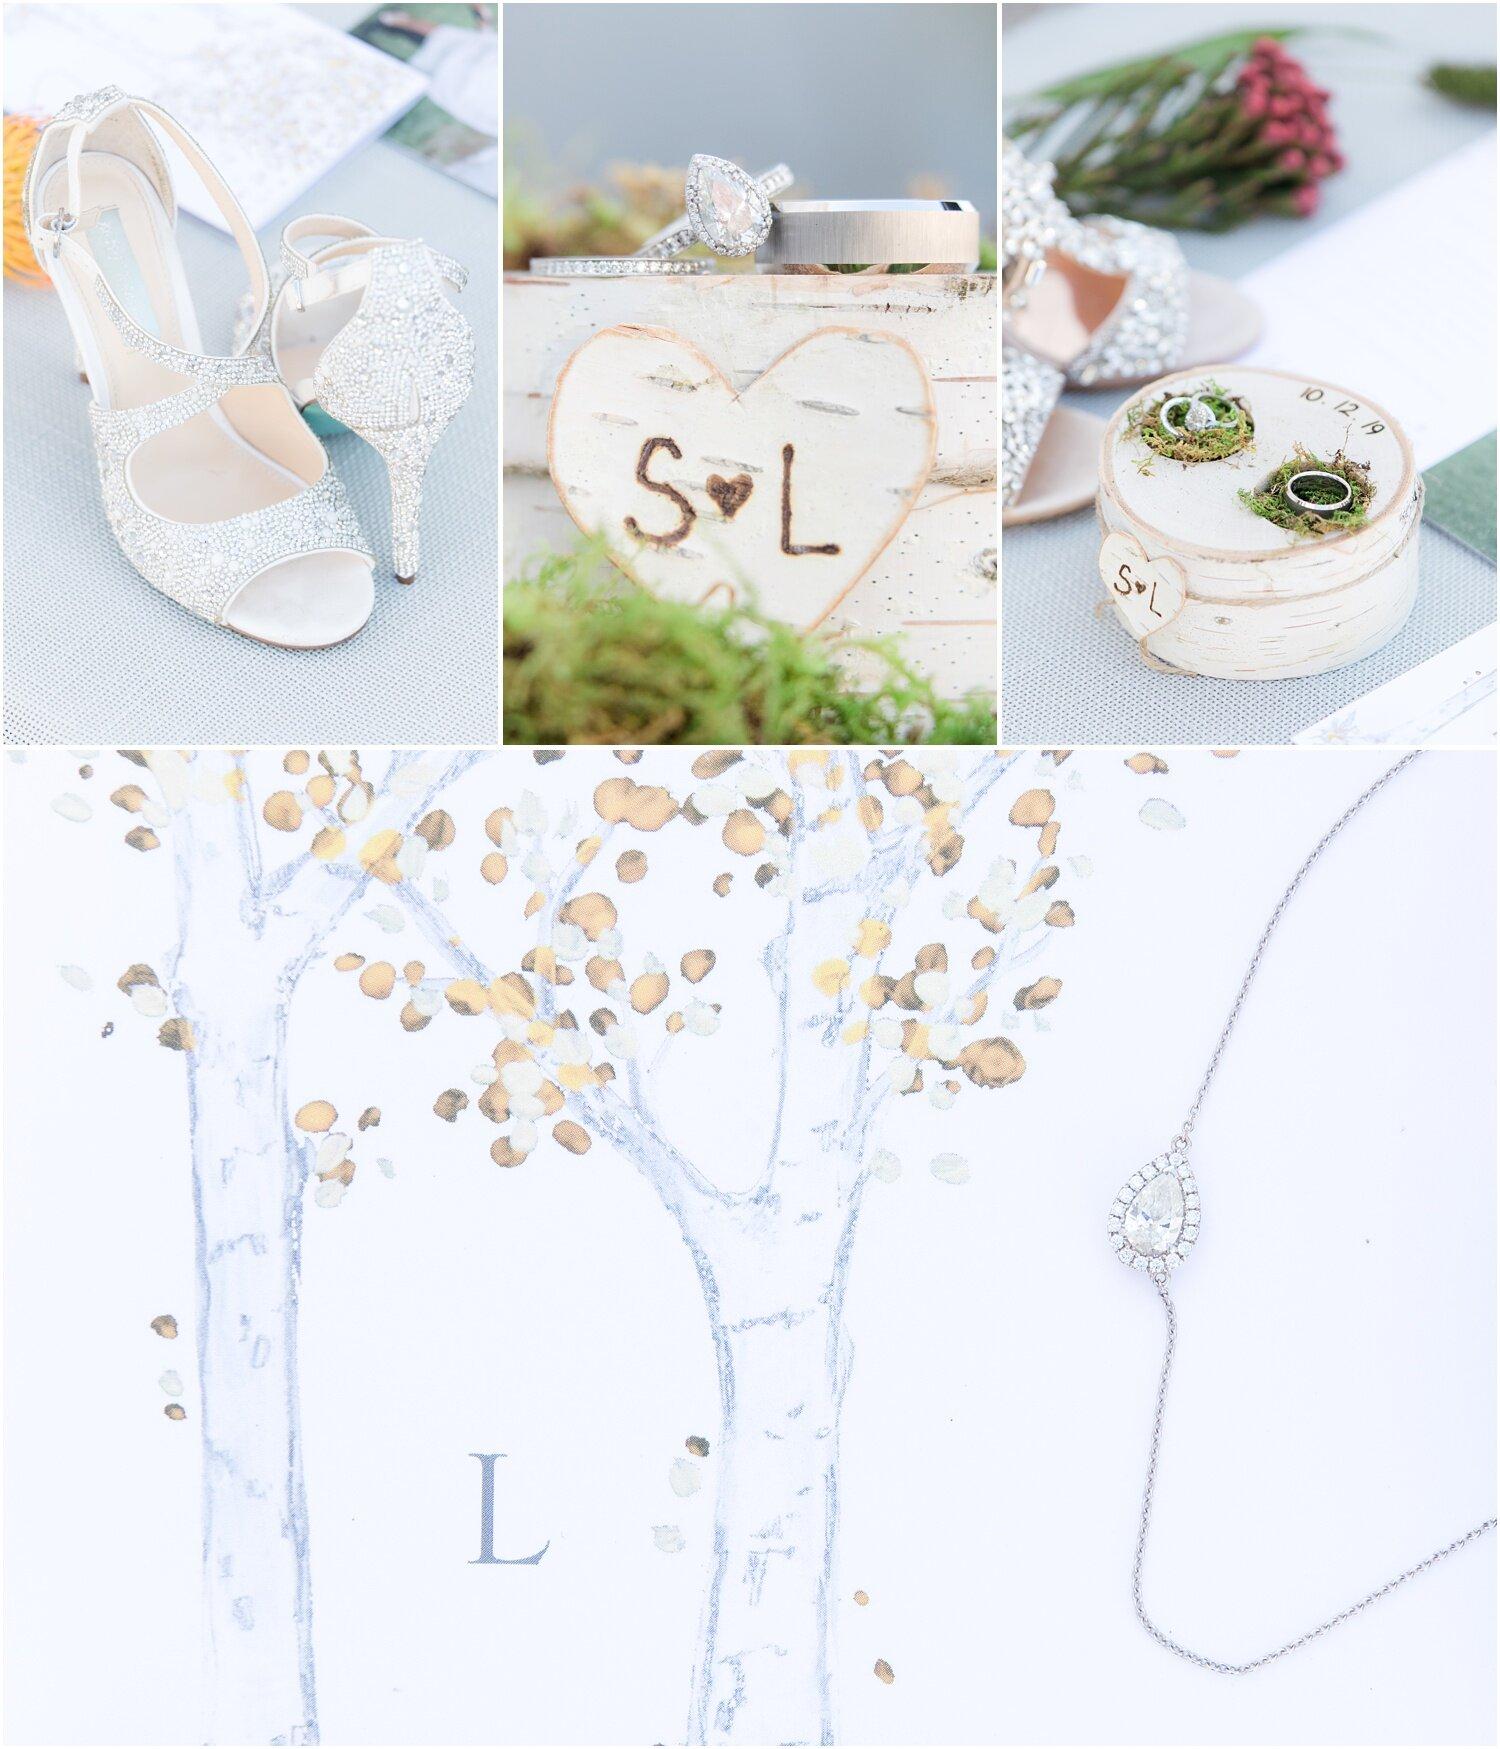 Custom Birch ring box an trifold wedding invitation.